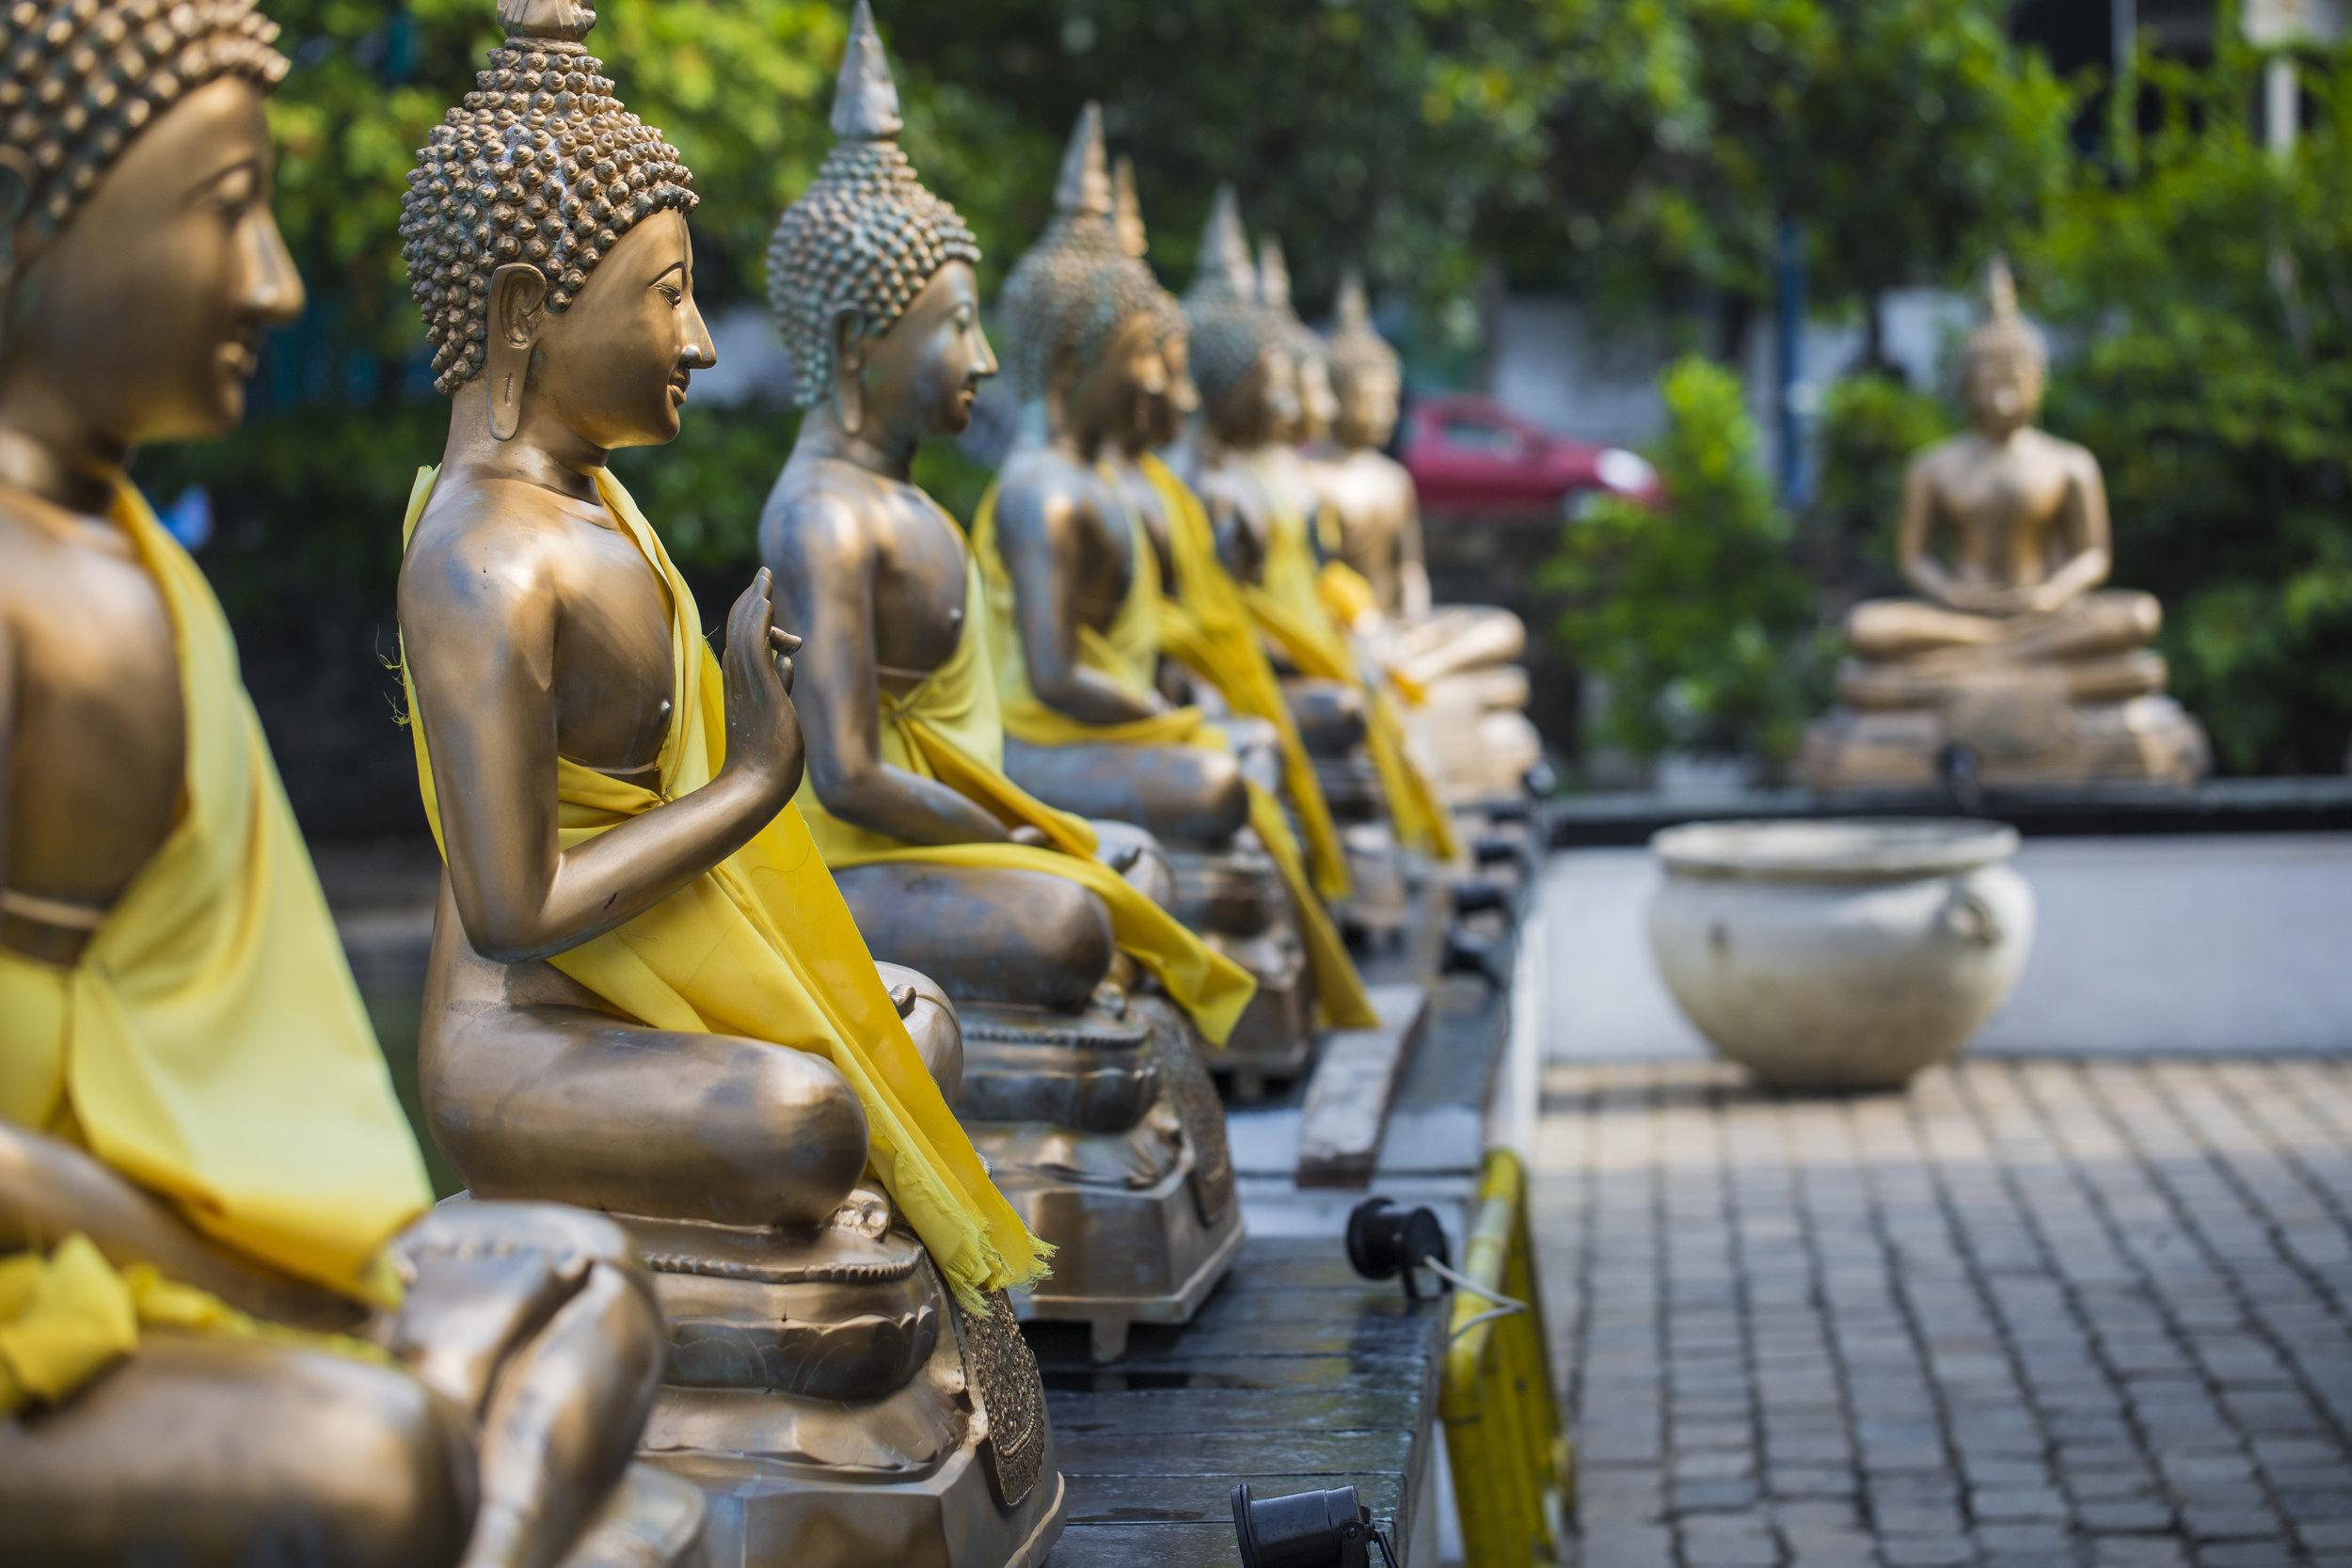 srilanka_bigstock-Buddha-Statues-In-Seema-Malaka-161364722.jpg